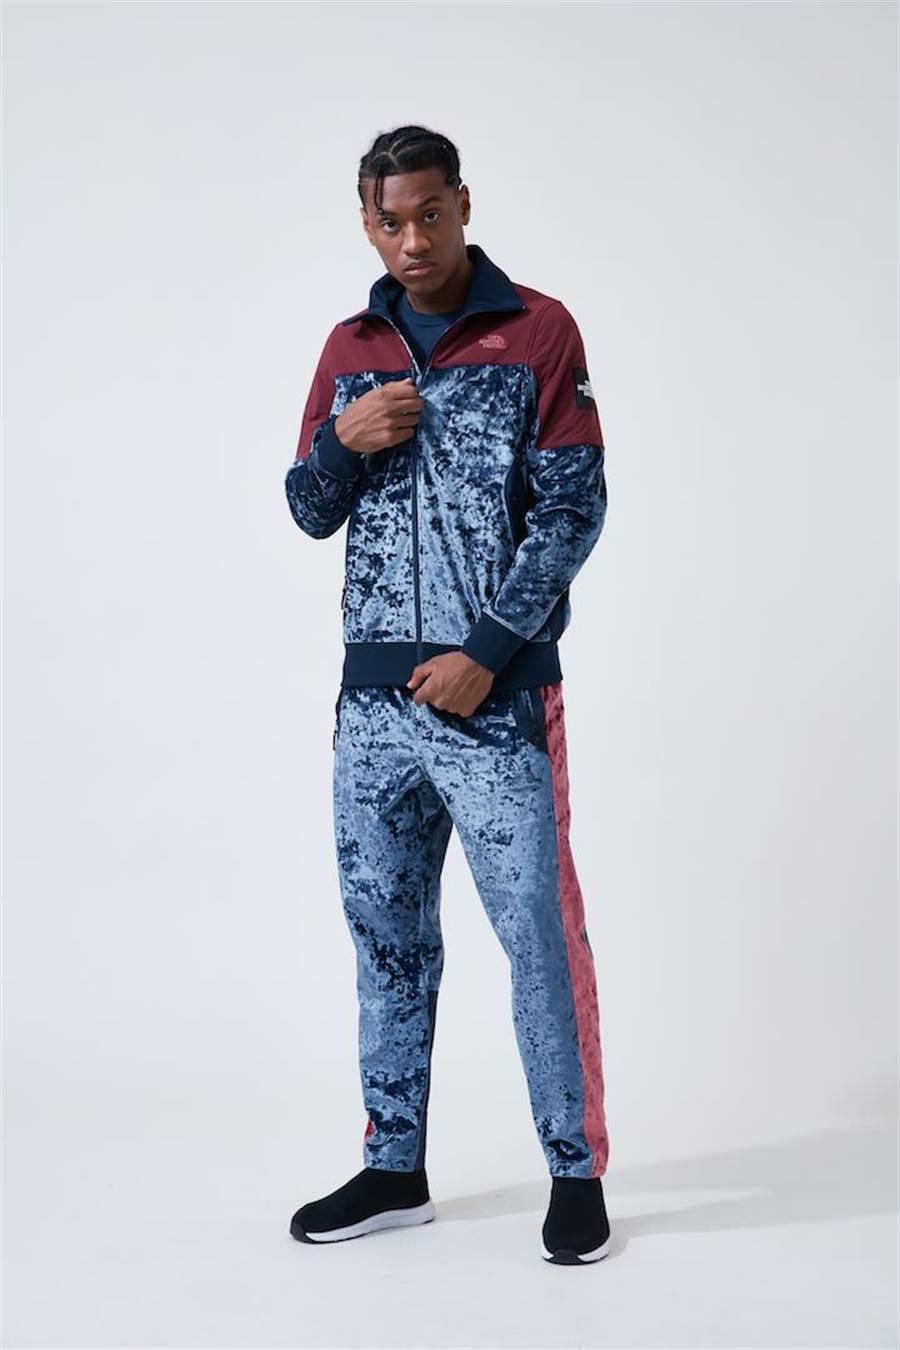 The North Face Urban Exploration Velvet Capsule同時推出成套絲絨教練夾克、運動褲,以及雙色拼接衛衣。(品牌提供)